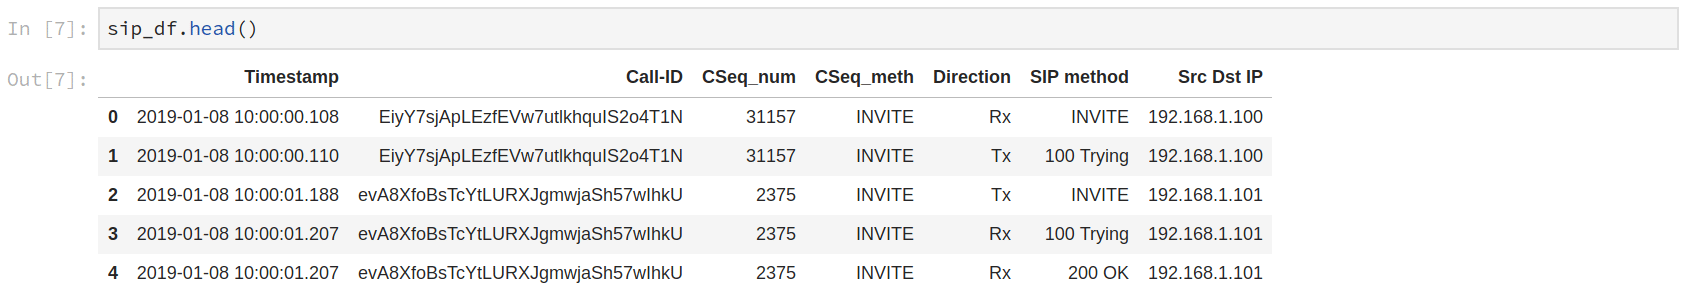 SIP text log analysis using Pandas   DataScience+